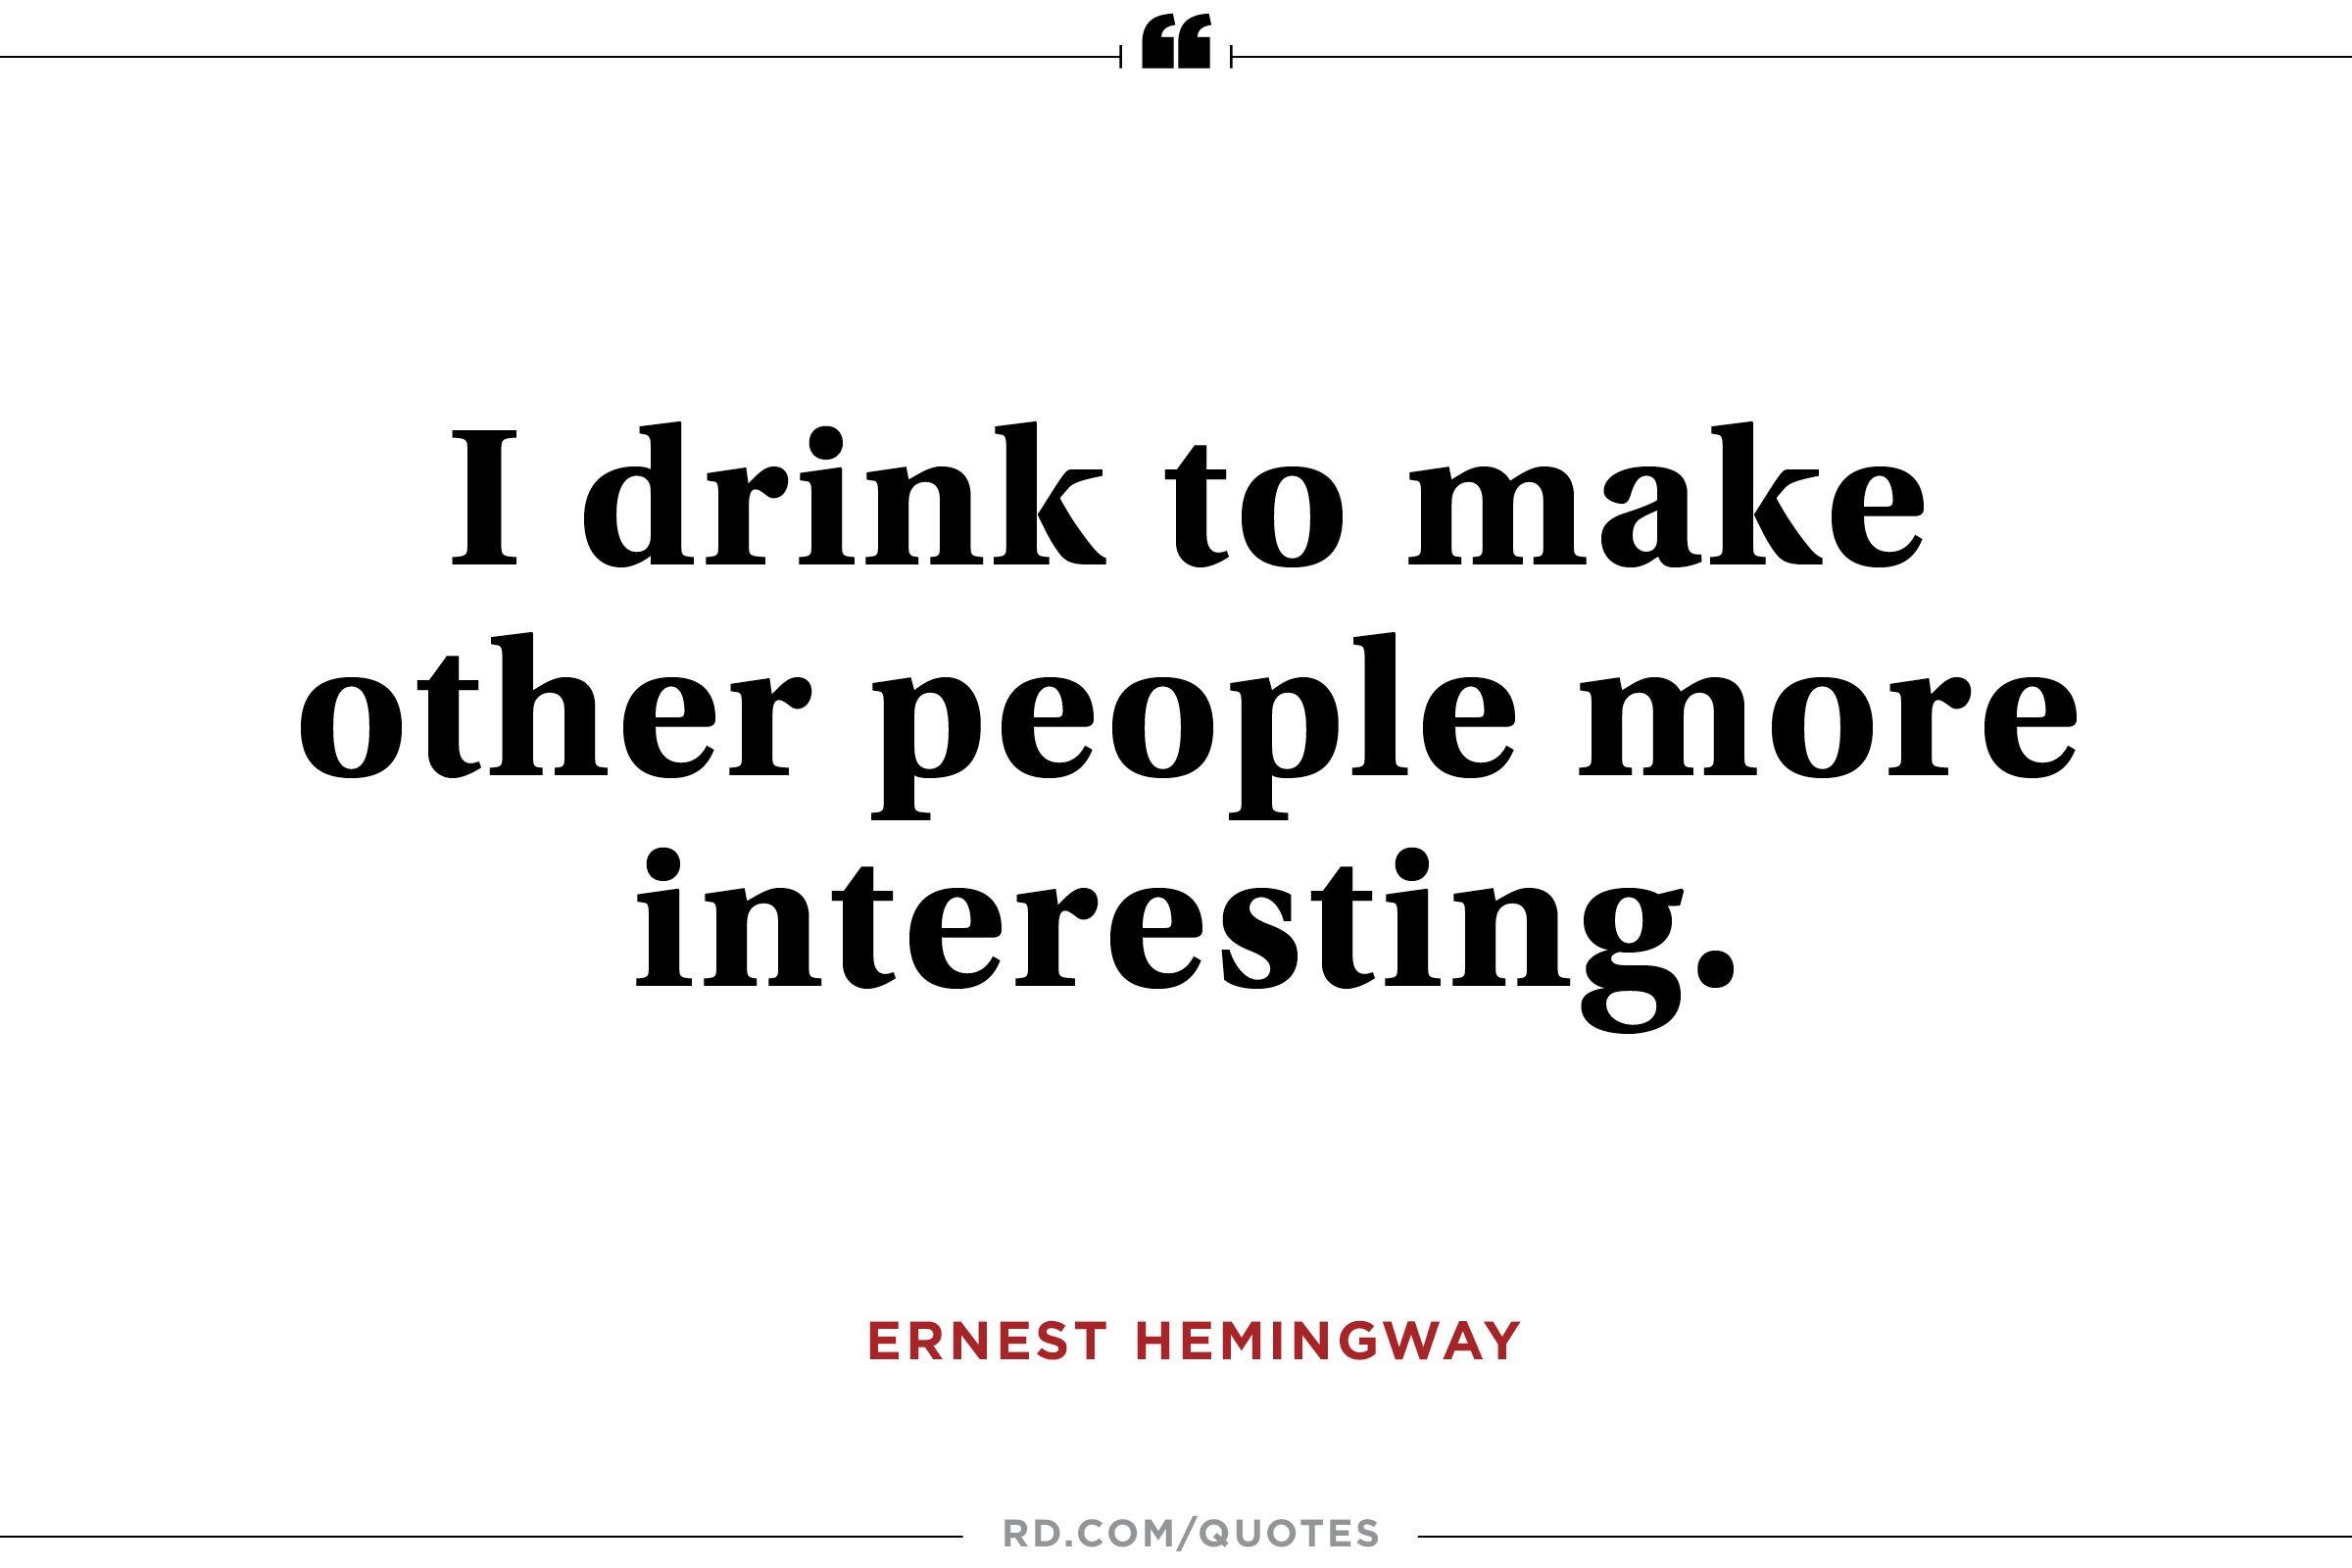 12 Inspiring Ernest Hemingway Quotes Readers Digest